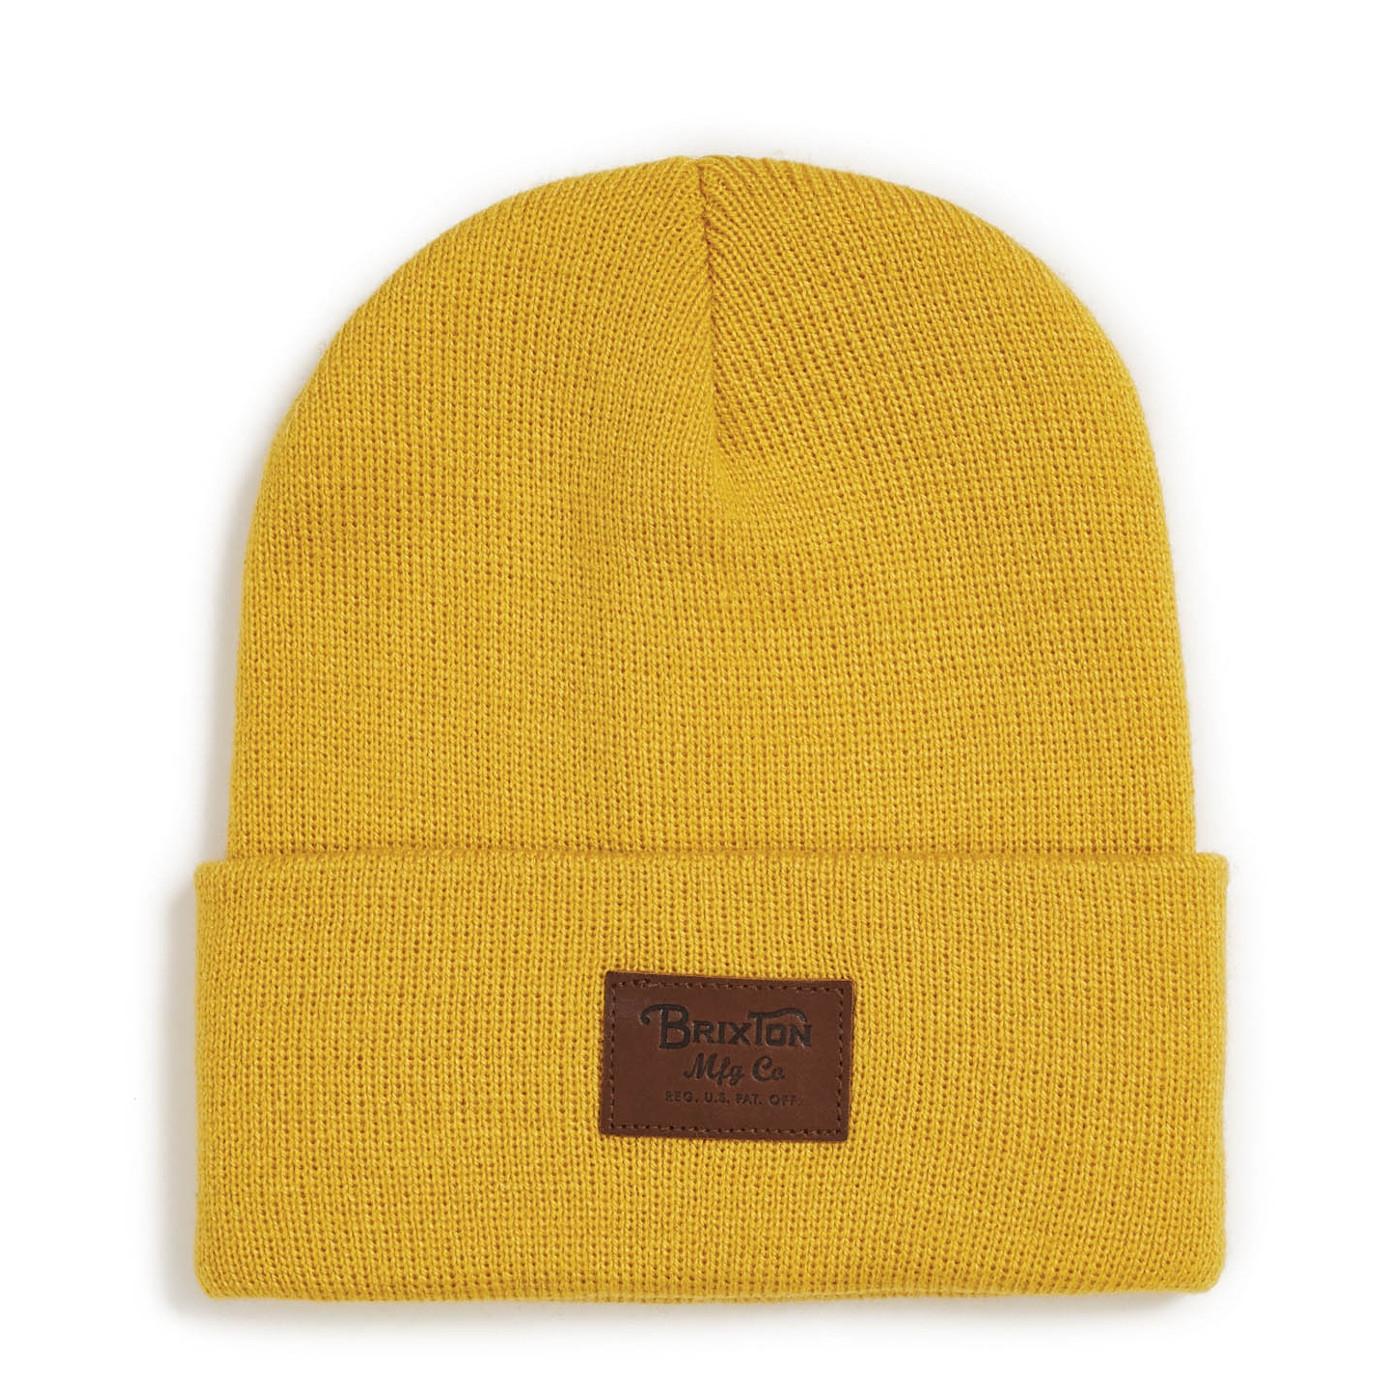 Brixton Grade bonnet 10213-MUSTARD - Brixton - Modalova